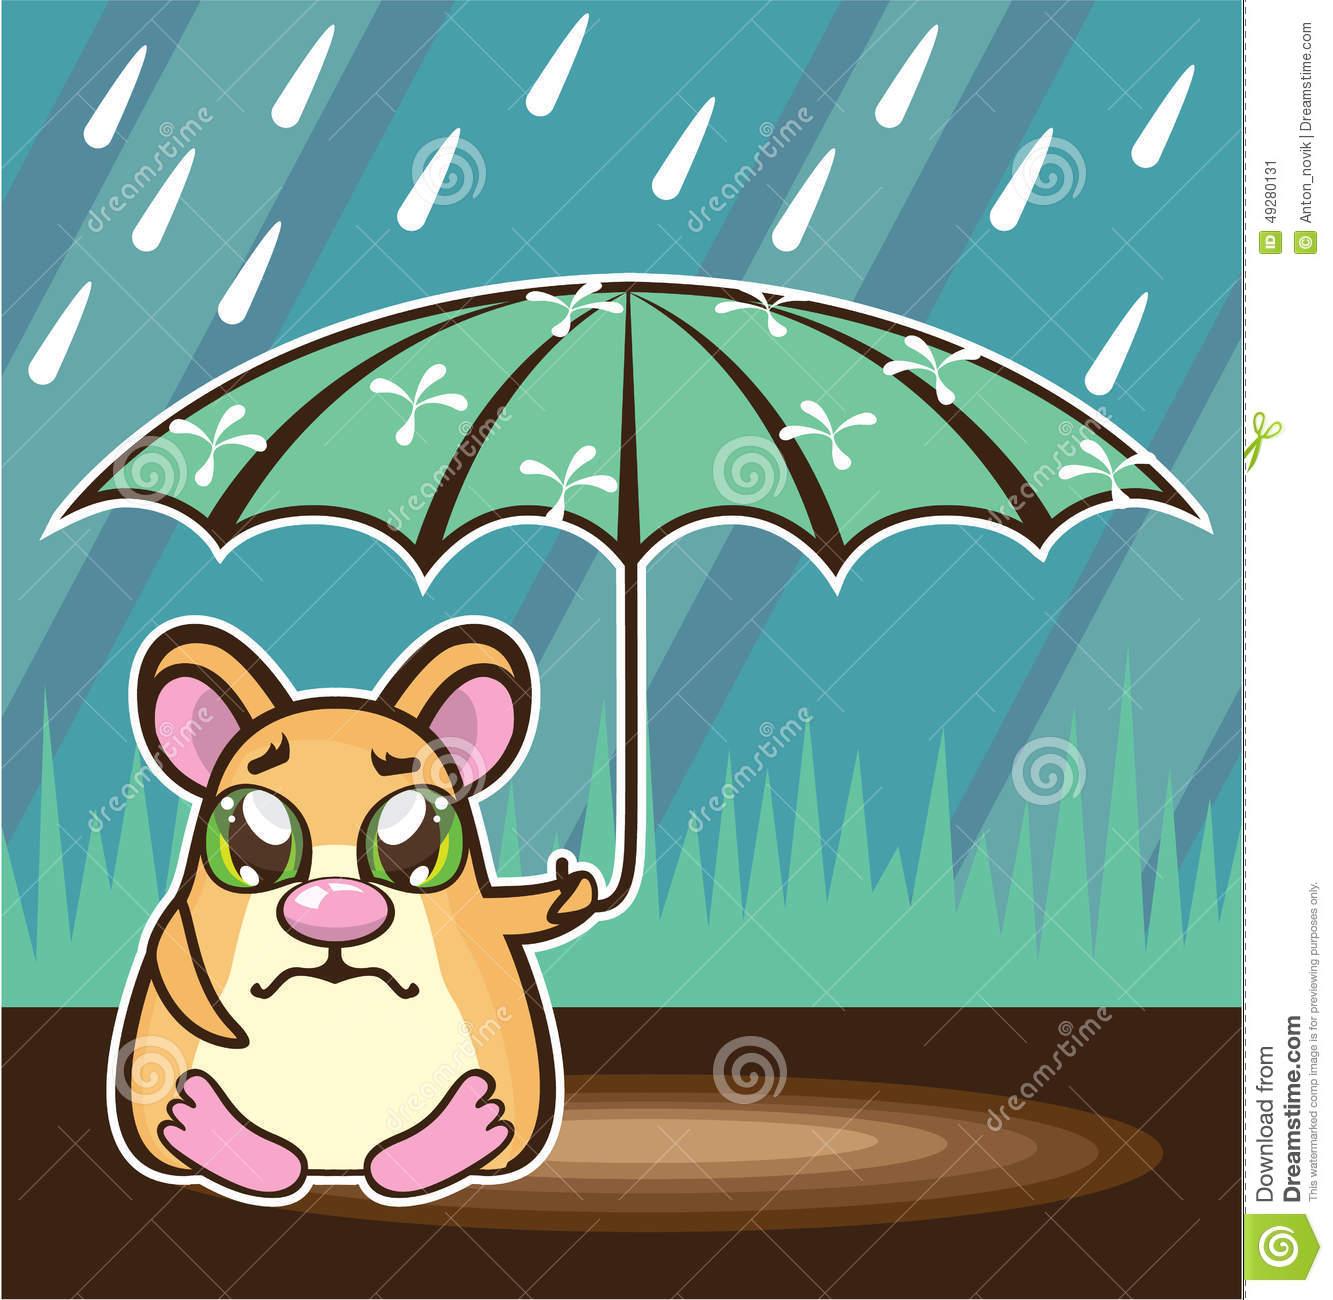 Homeless Hamster Cartoon Stock Vector.